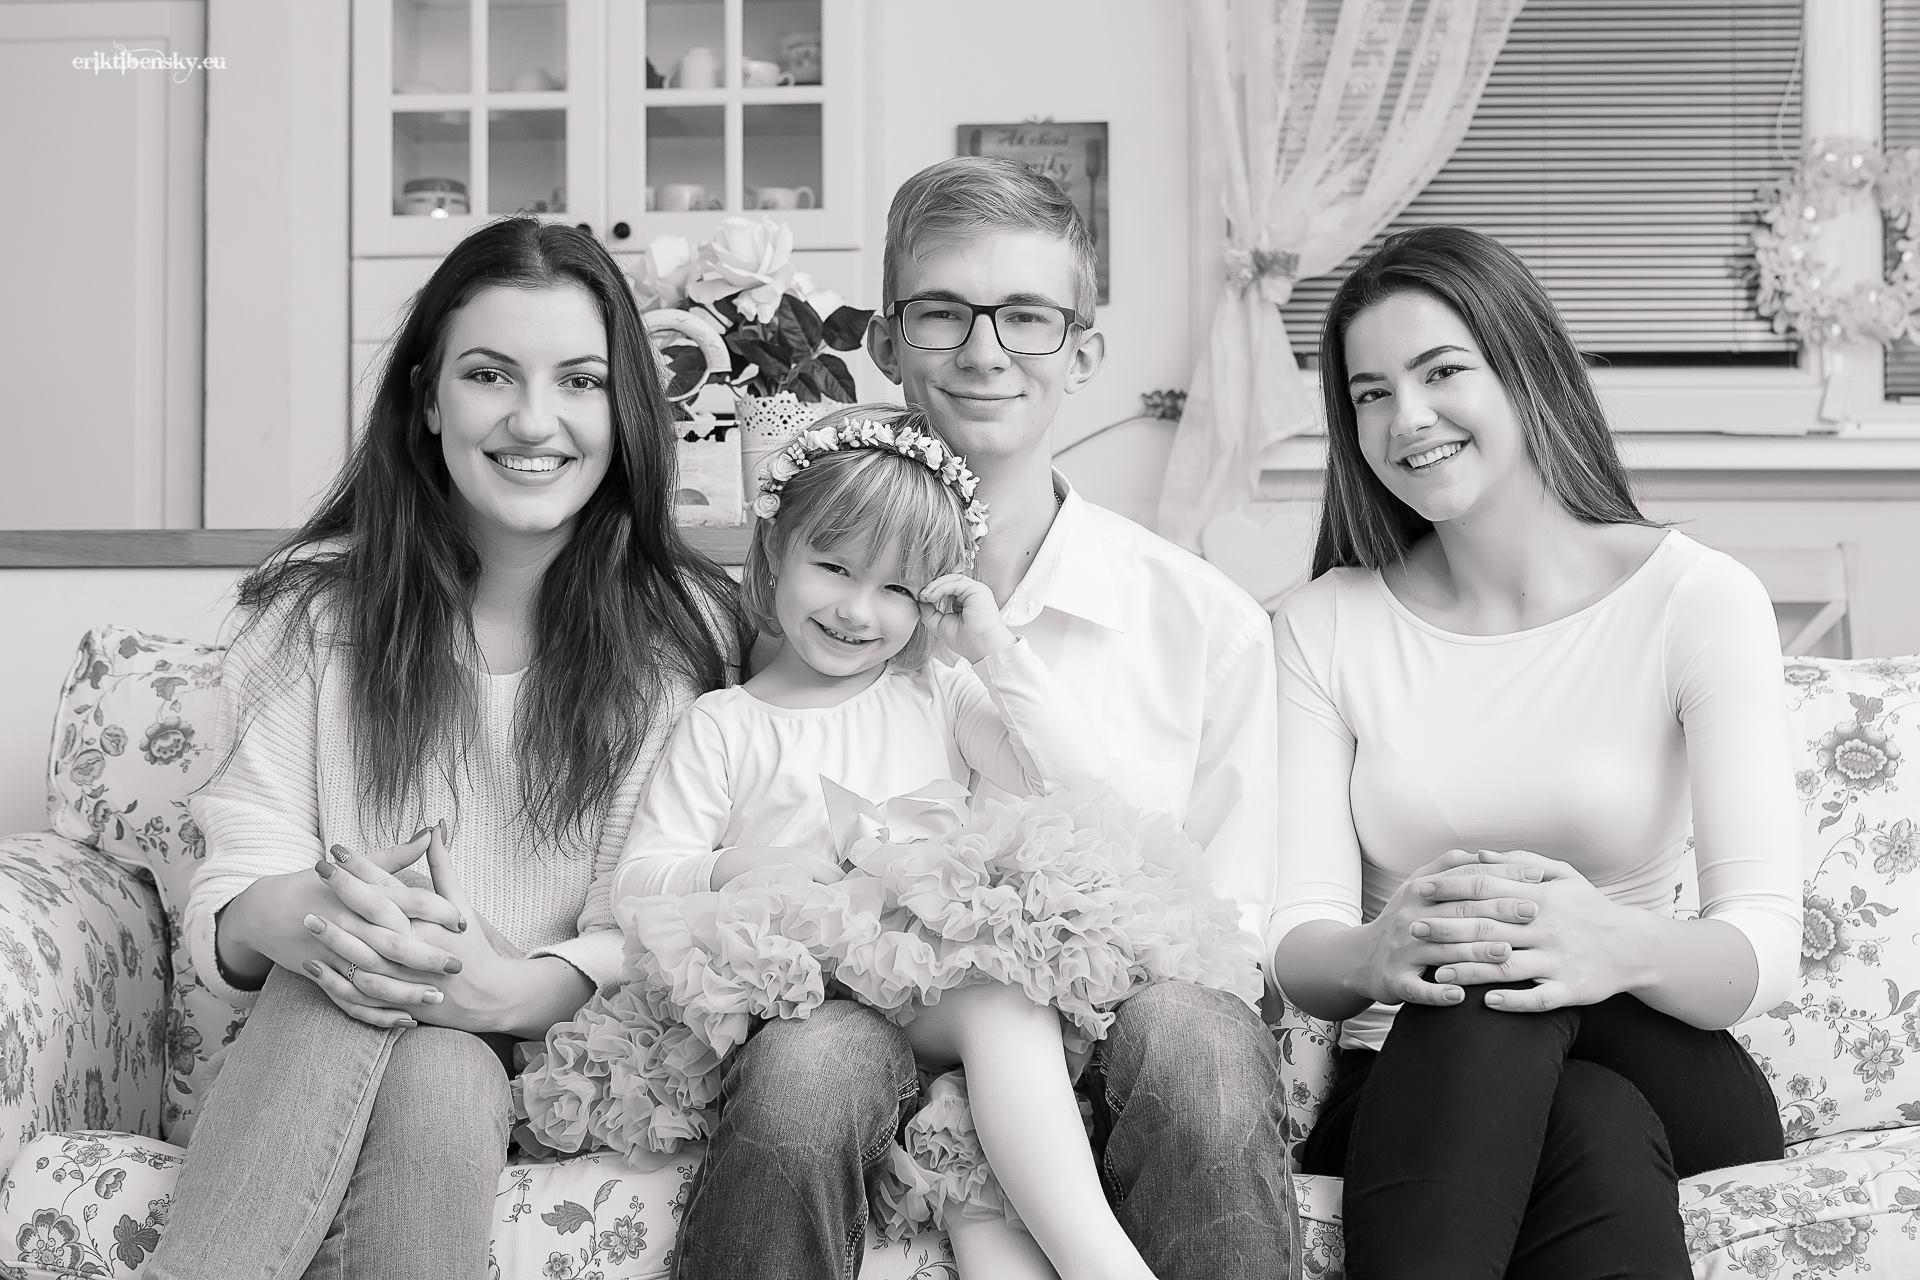 eriktibensky-eu-fotograf-home-photo-family-rodina-kids-deti-1005